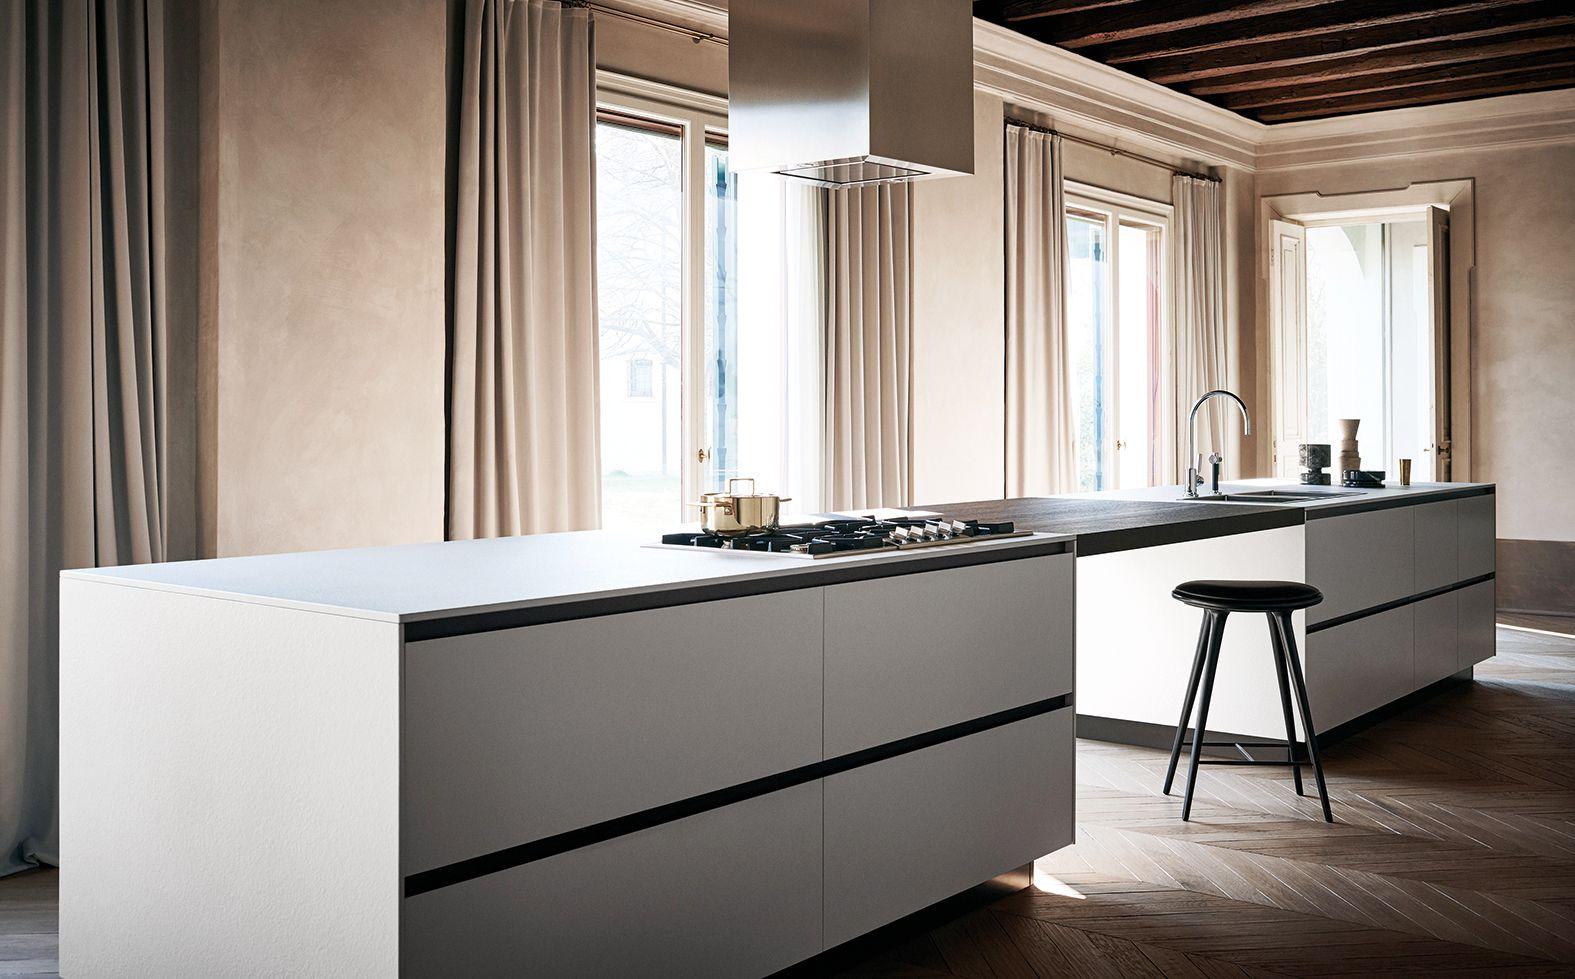 Cesar Modern Kitchen Maxima 2 2 Kitchen Fittings Modern Kitchen Contemporary Kitchen